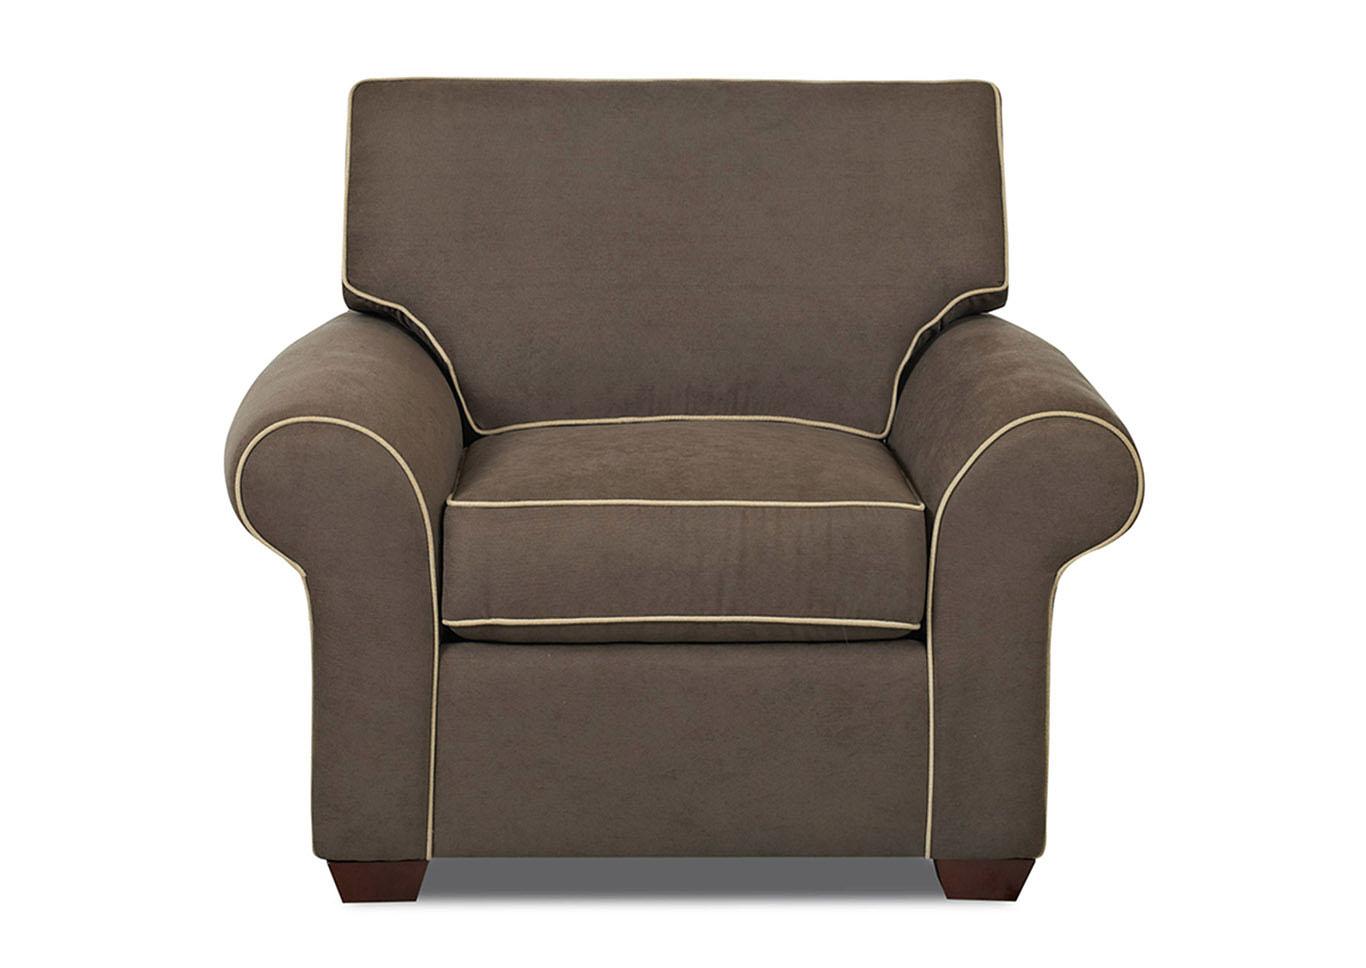 Awesome Harolds Furniture Lebanon Pa Patterns Stationary Fabric Spiritservingveterans Wood Chair Design Ideas Spiritservingveteransorg